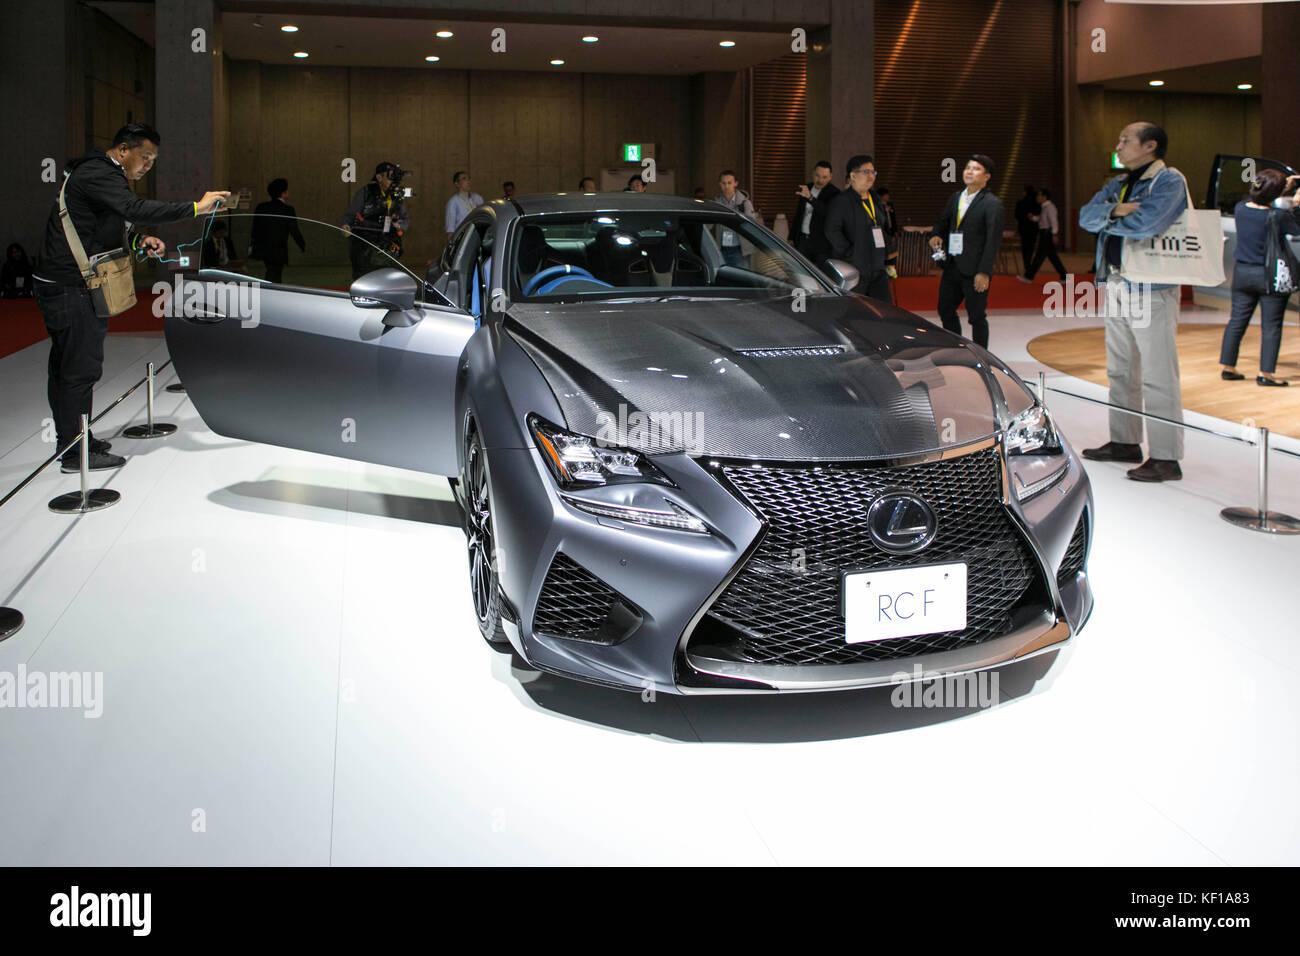 Lexus presents its new concept cars at 45th Tokyo Motor Show. Credit: Yuichiro Tashiro /Alamy Live News Stock Photo